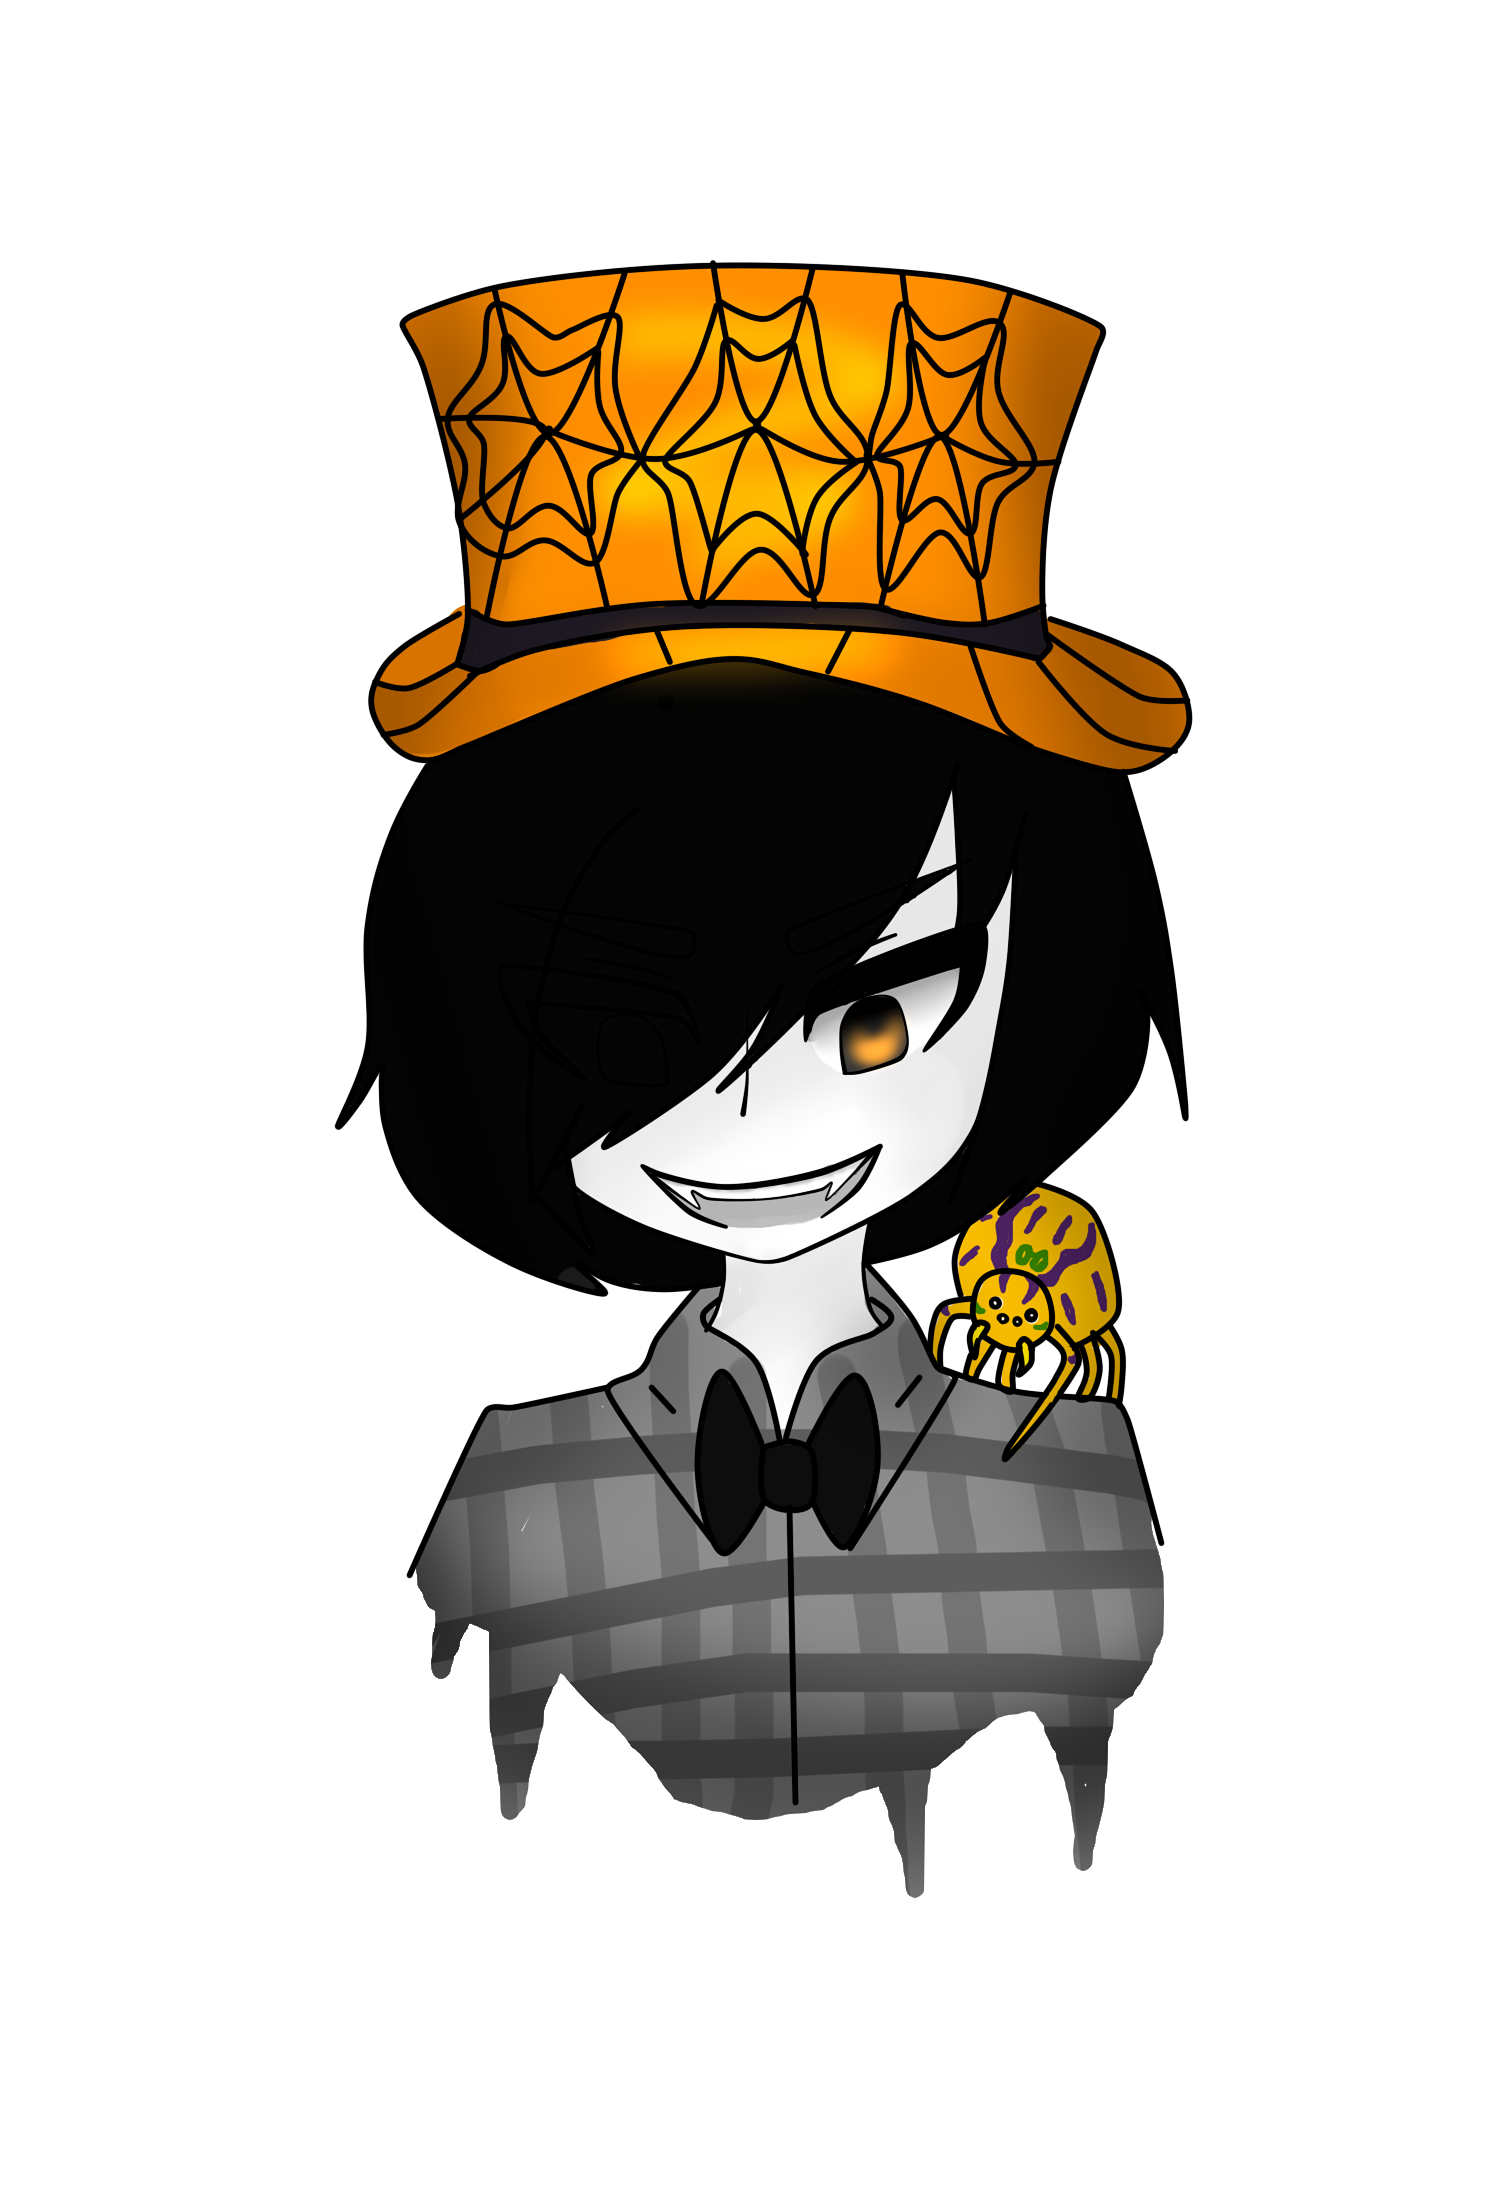 Spook man